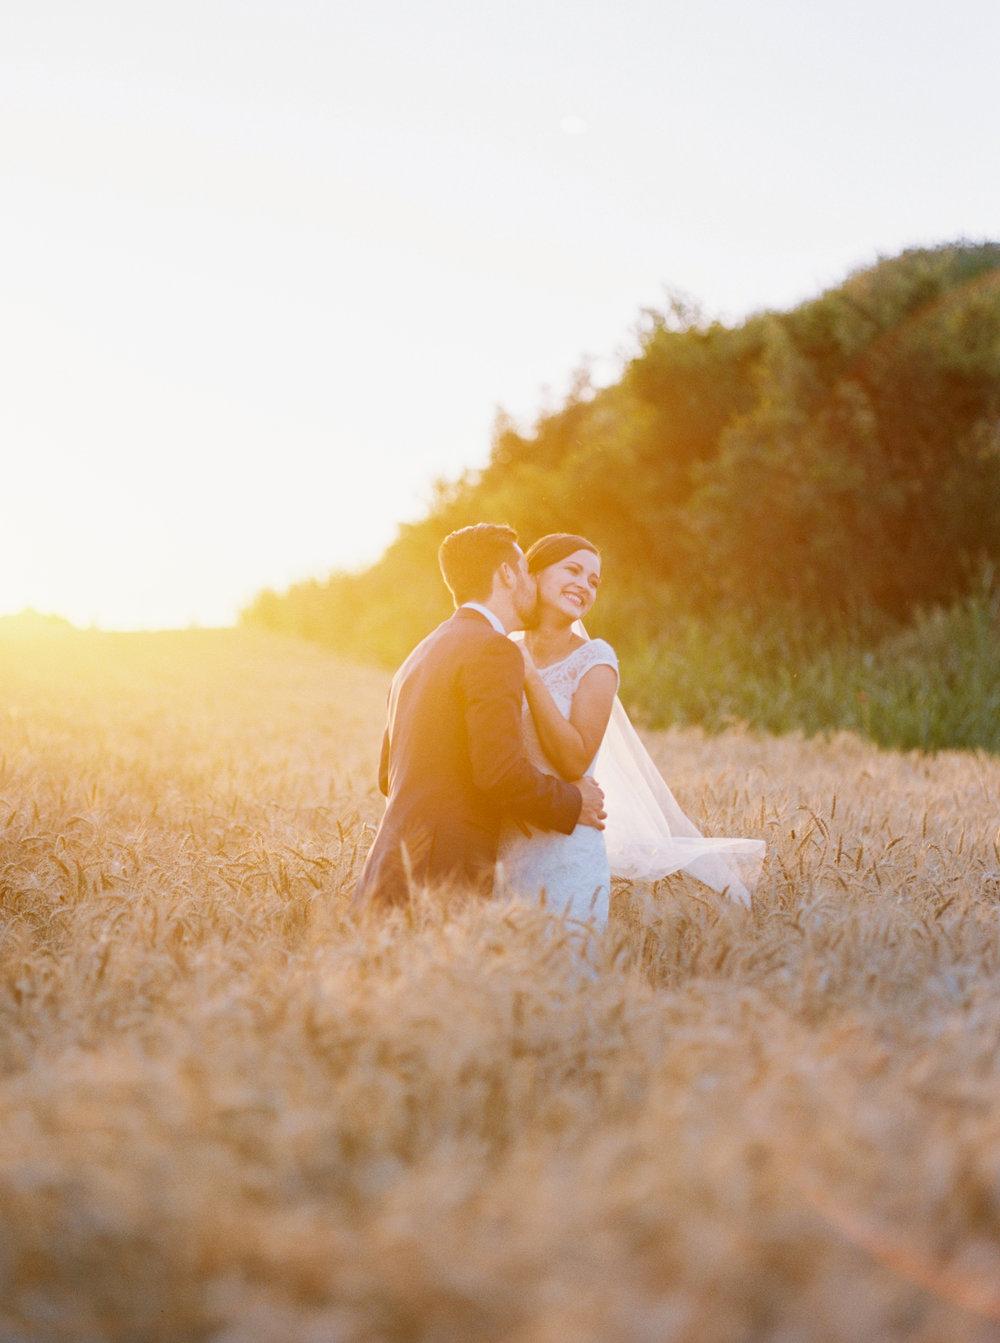 Quiton_Katie Kansas Wedding-0008.jpg